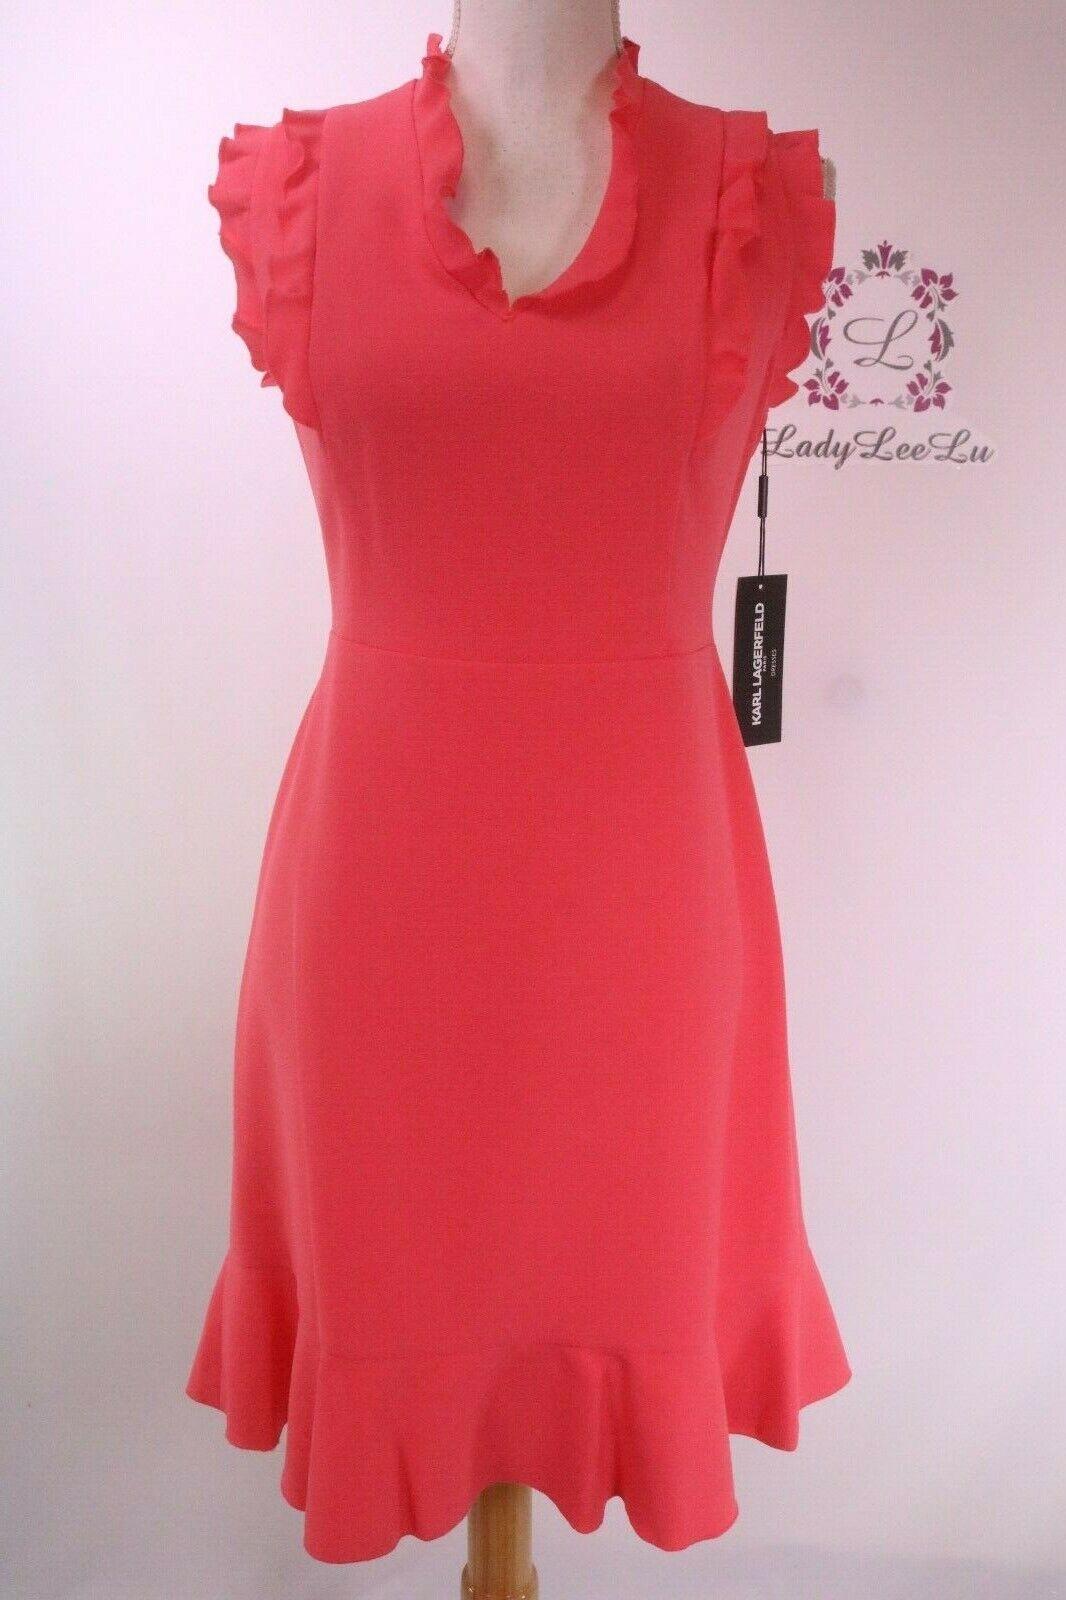 Karl Lagerfeld Cap Sleeve Crepe Dress With Ruffled Trim LD8E12U9 Size 8 New NWT